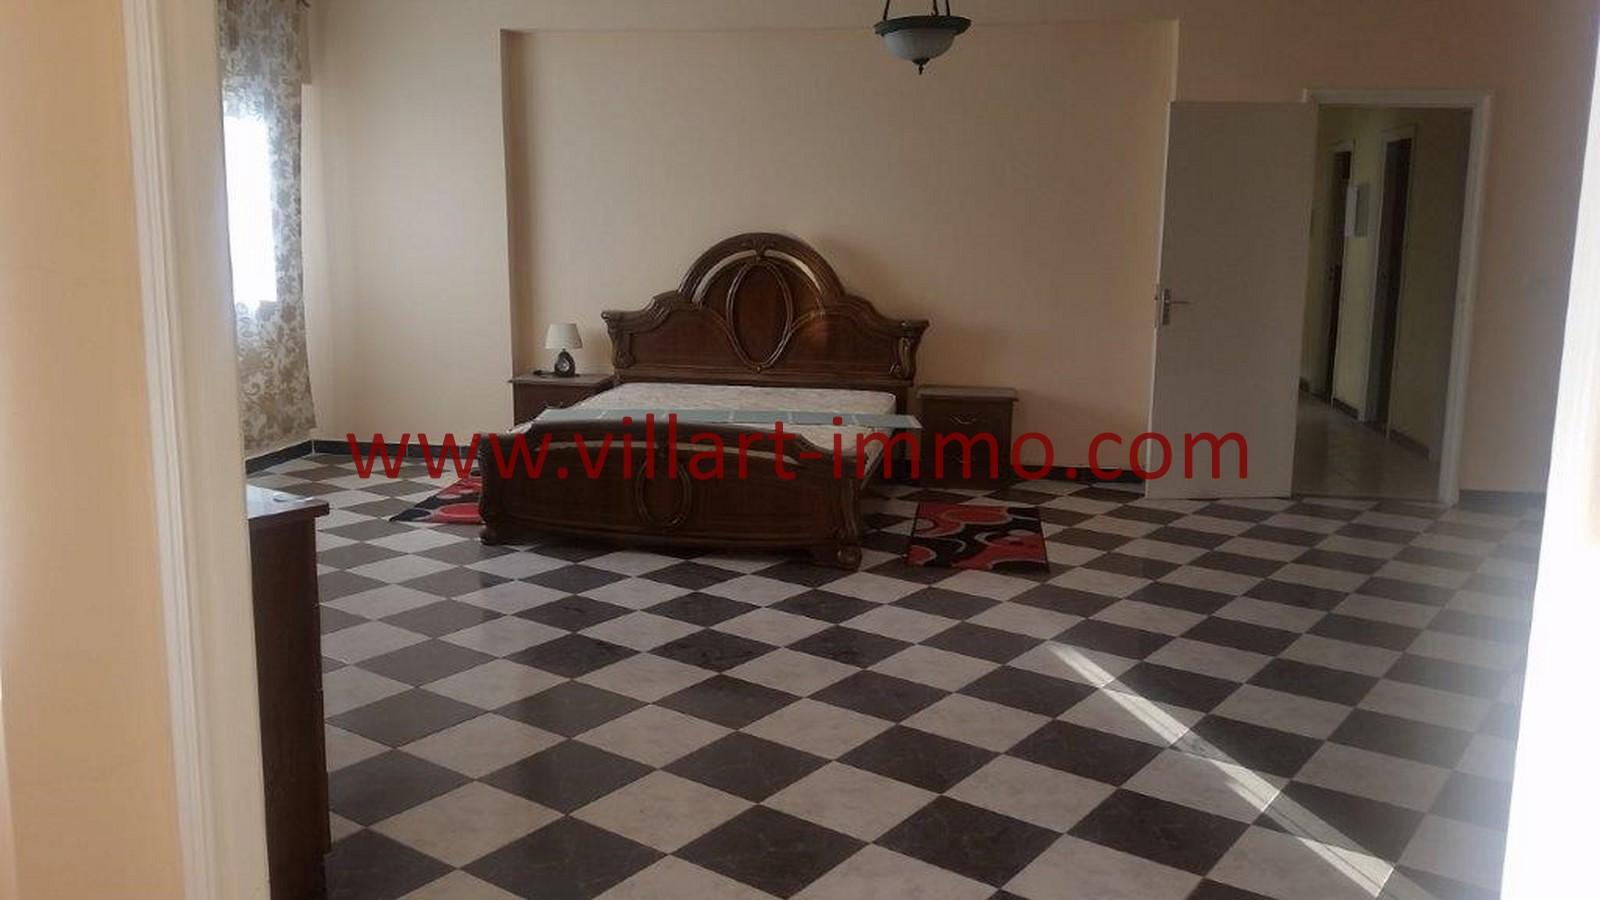 5-location-tanger-appartement-non-meublee-iberia-chambre-principale-1-l1013-villart-immo-agence-immobiliere